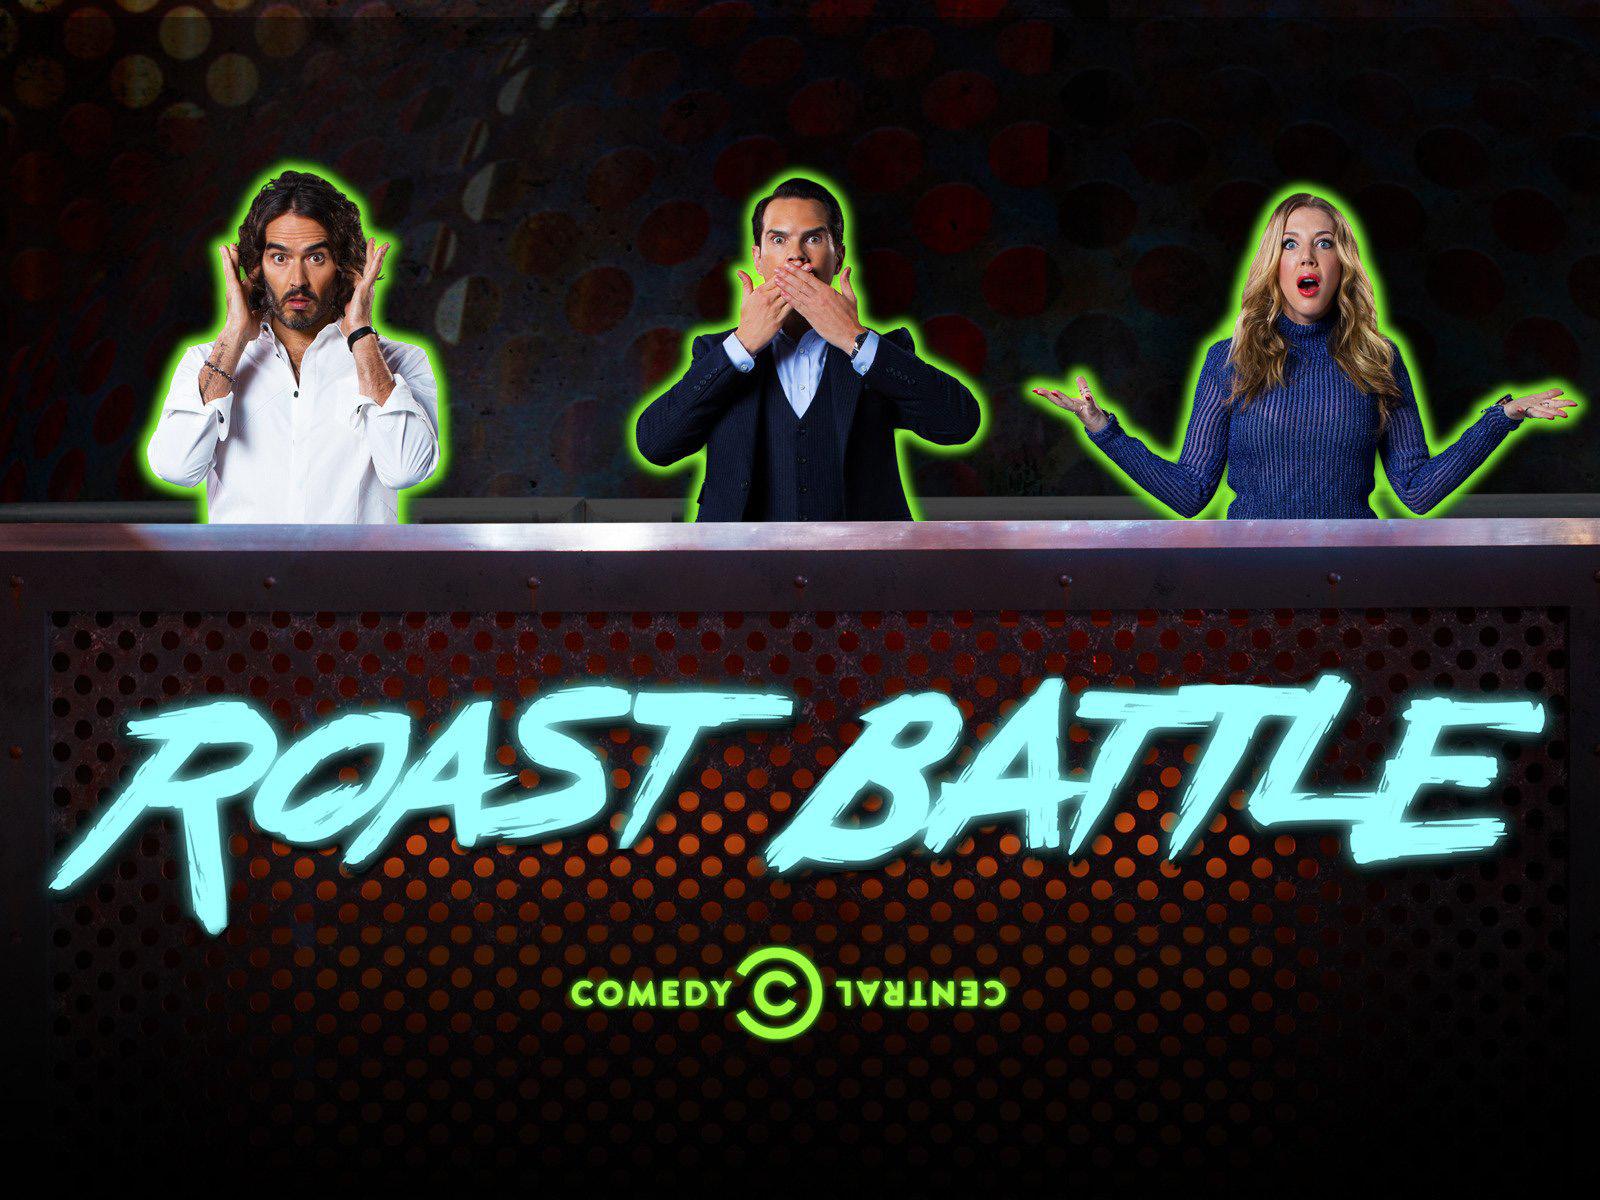 Comedy Central Roast Battle - Key Art + Stop Motion Animation